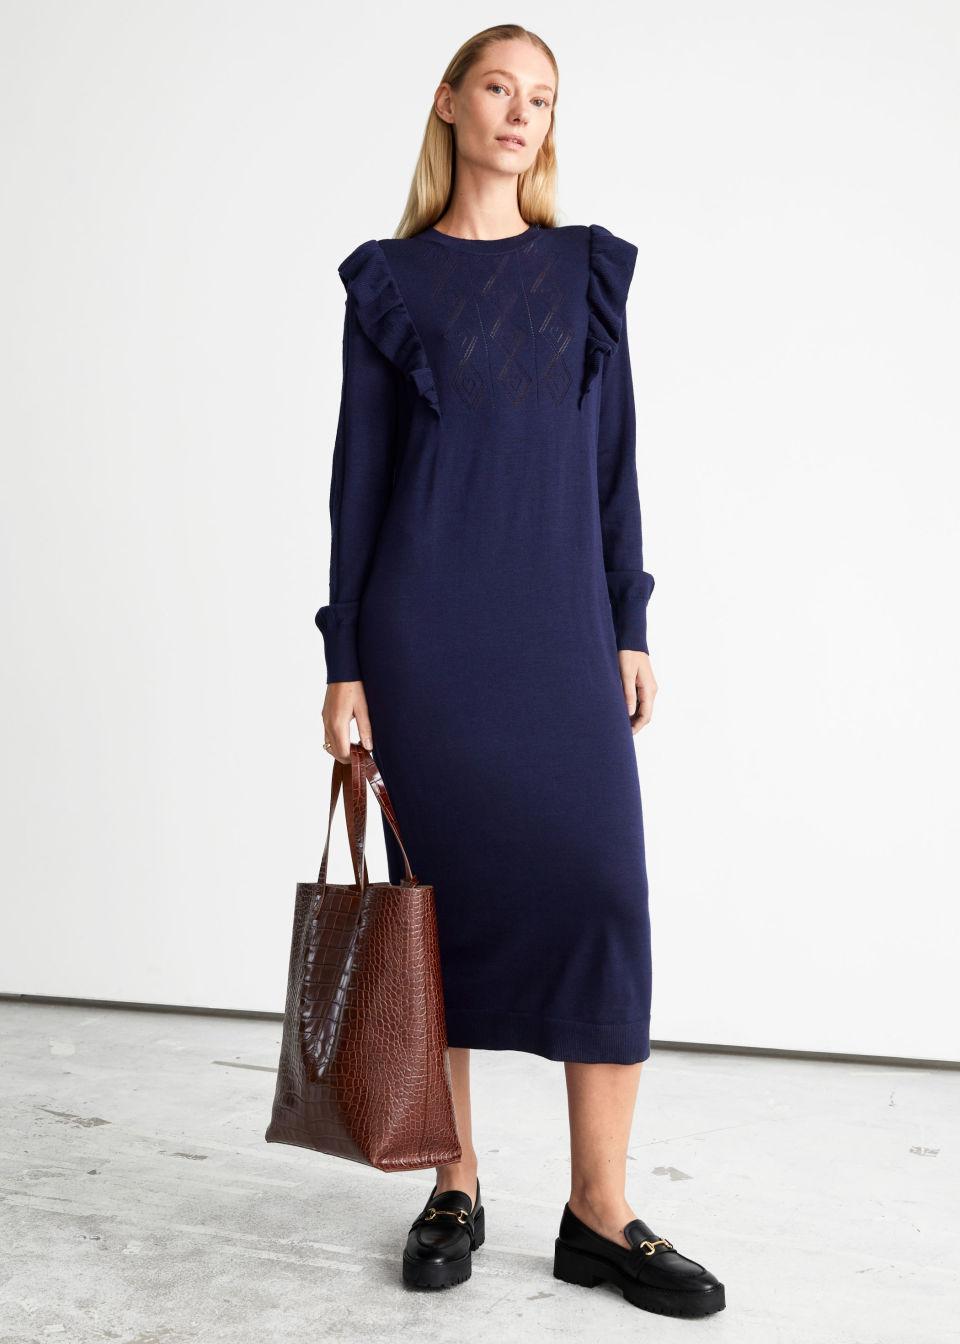 Pointelle Knit Midi Dress